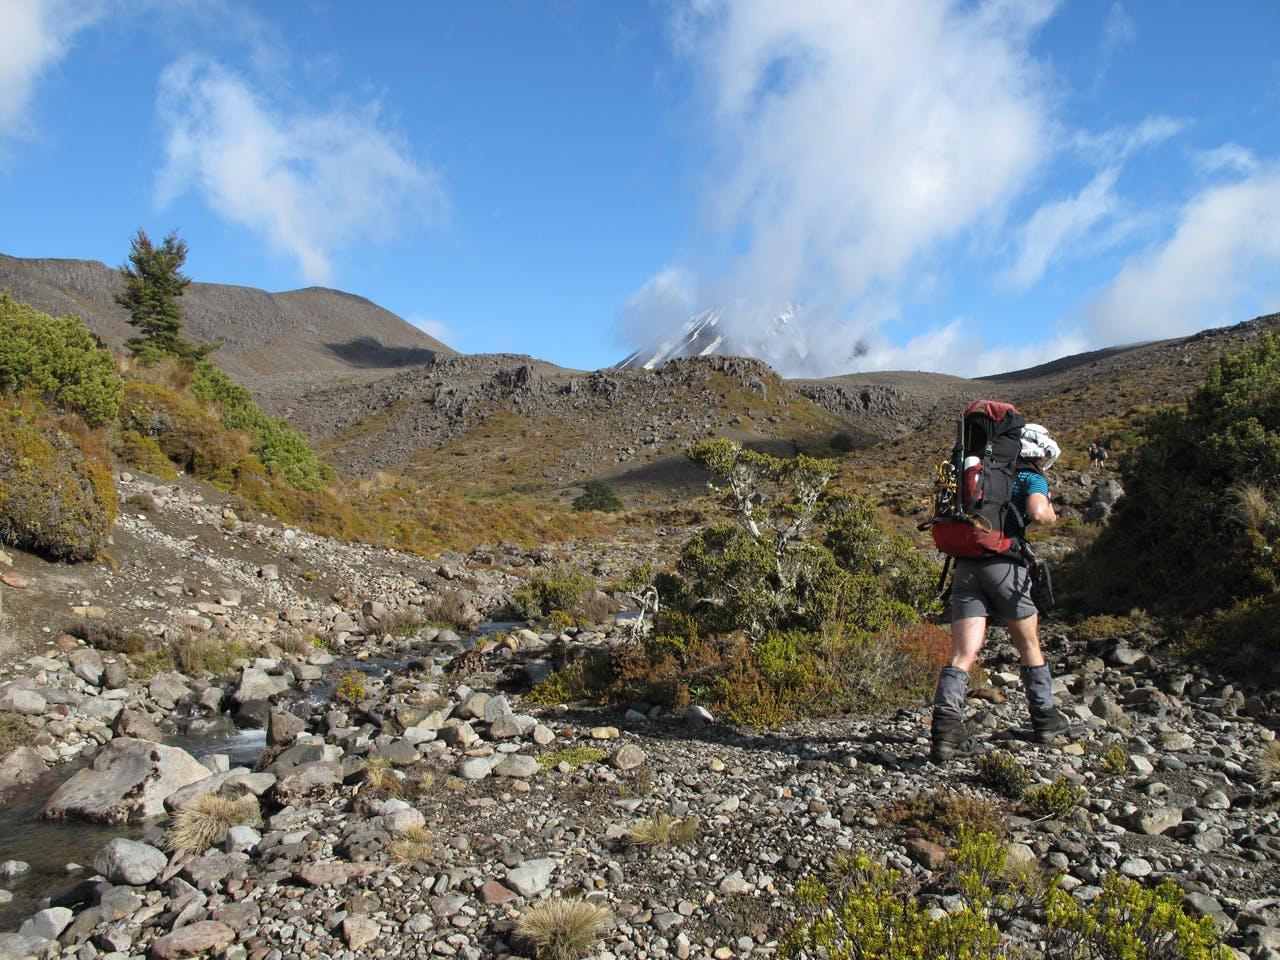 Tramping up the Waihohonu to reach the campsite. Photo: Richard Davies